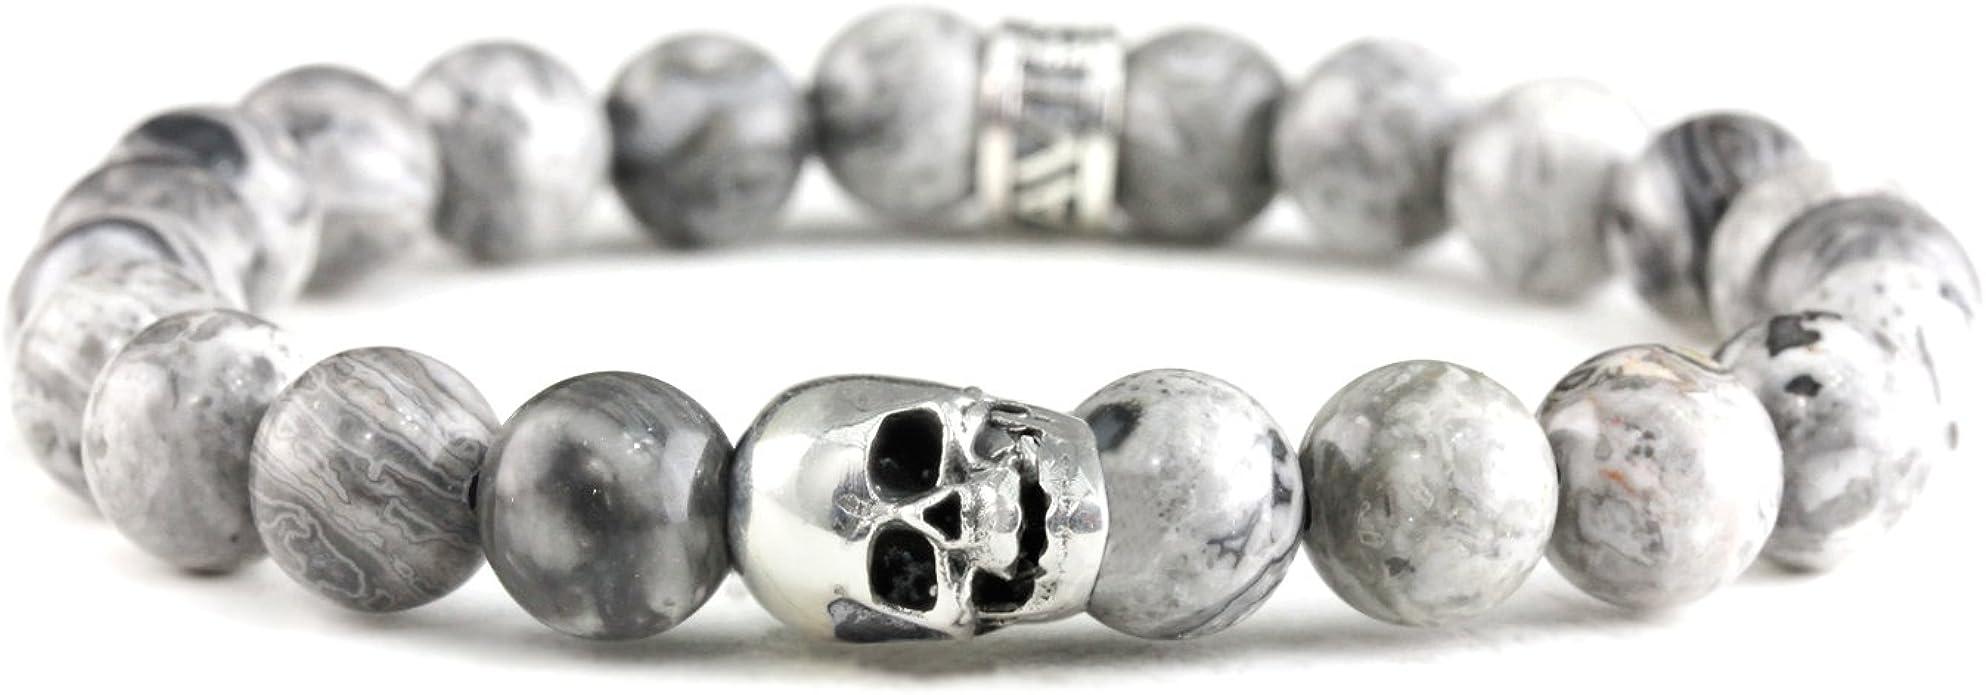 Acheter bracelet tete de mort online 9